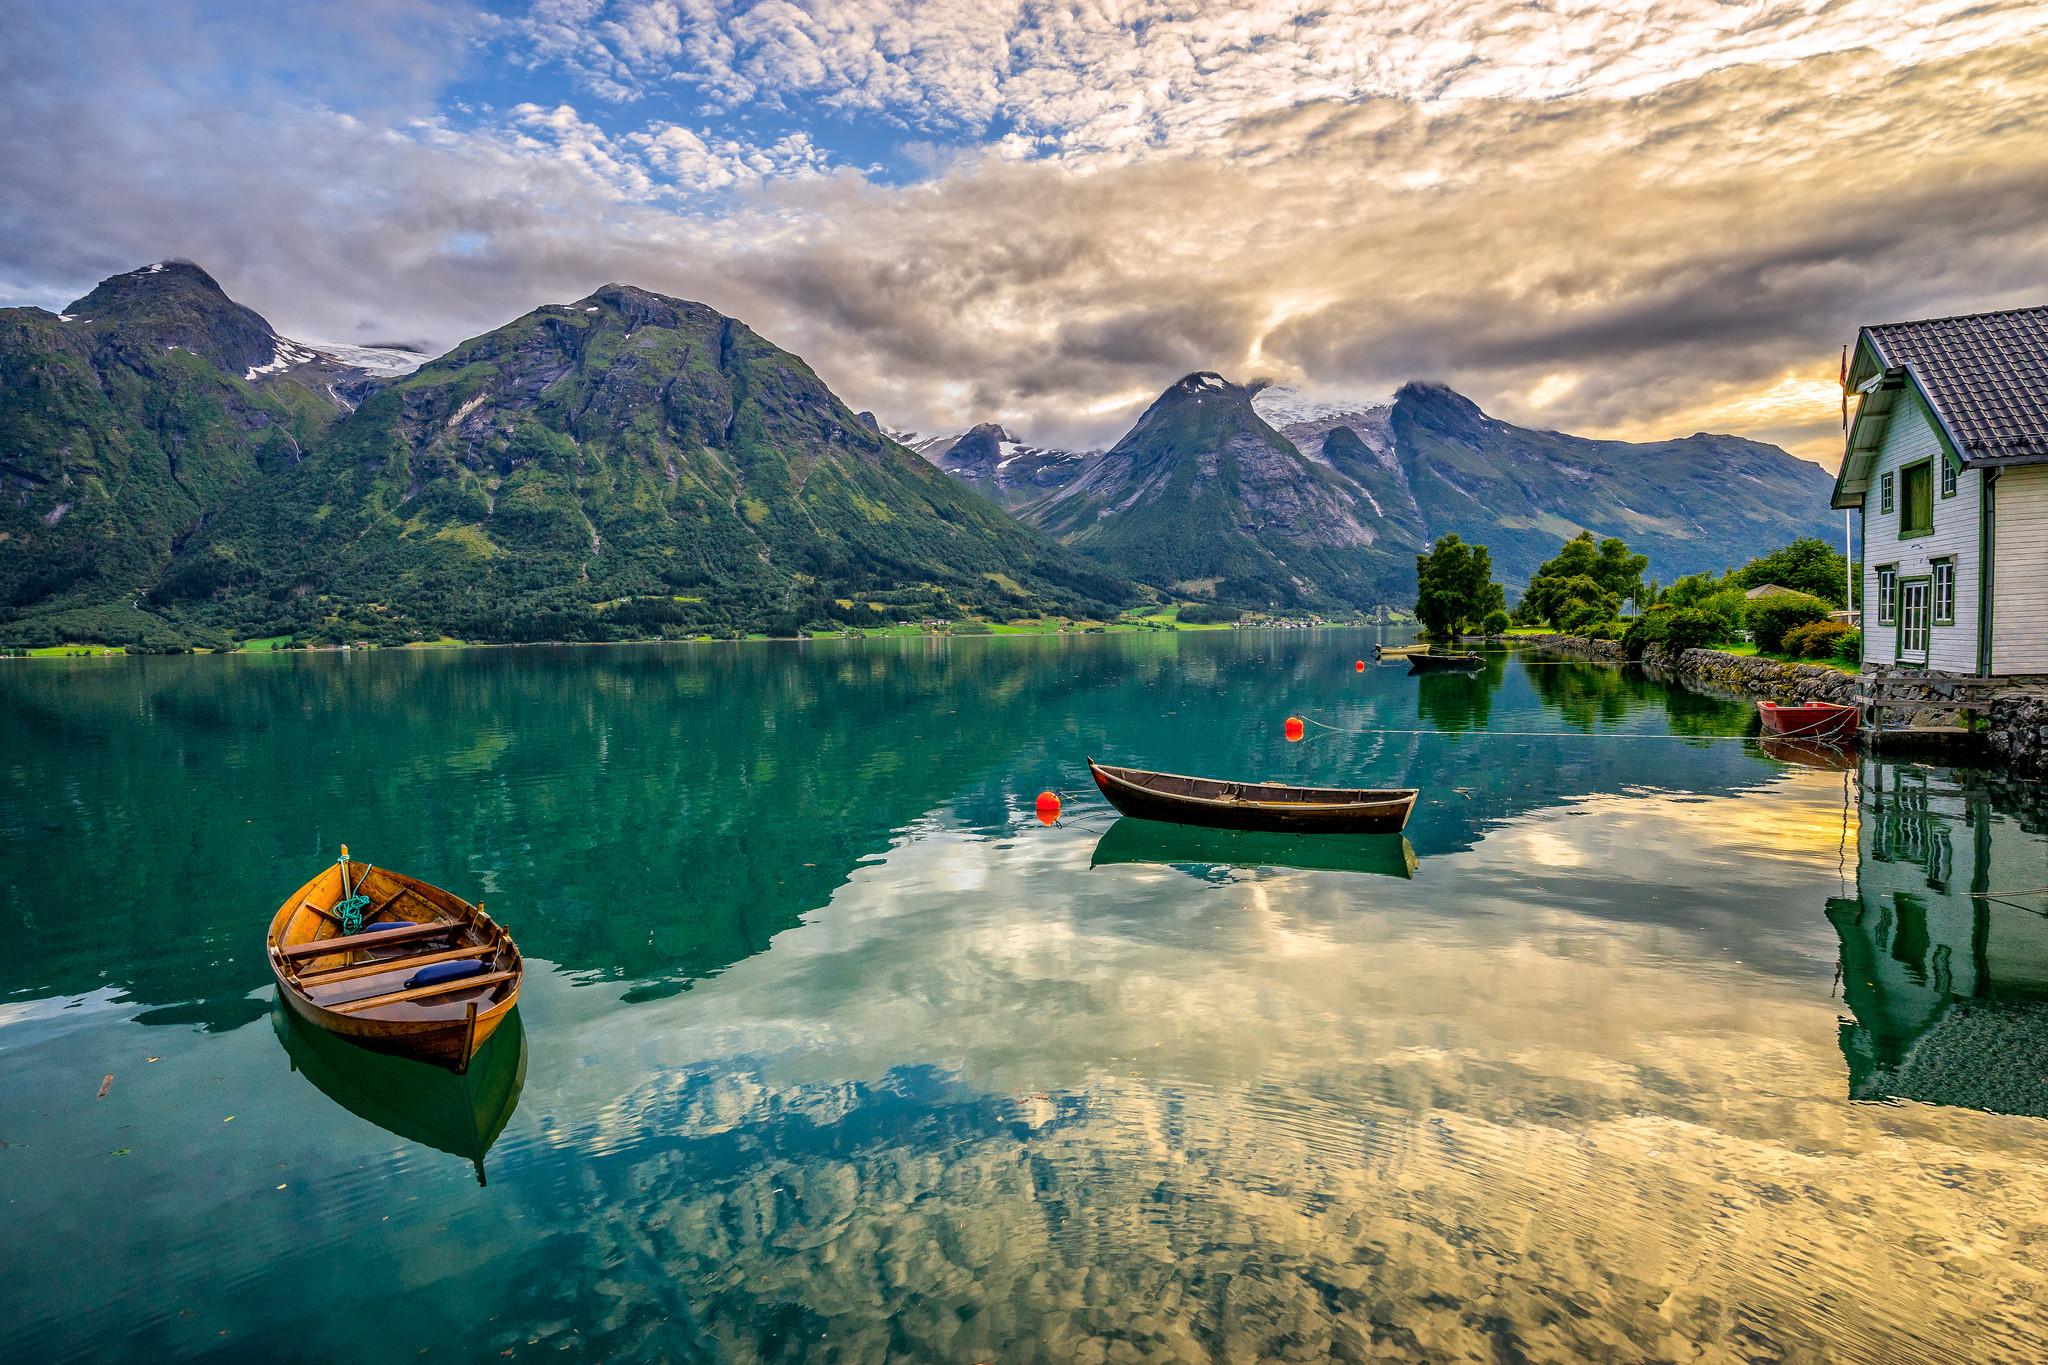 обои Norwegian romantic nationalism, закат, озеро, горы картинки фото